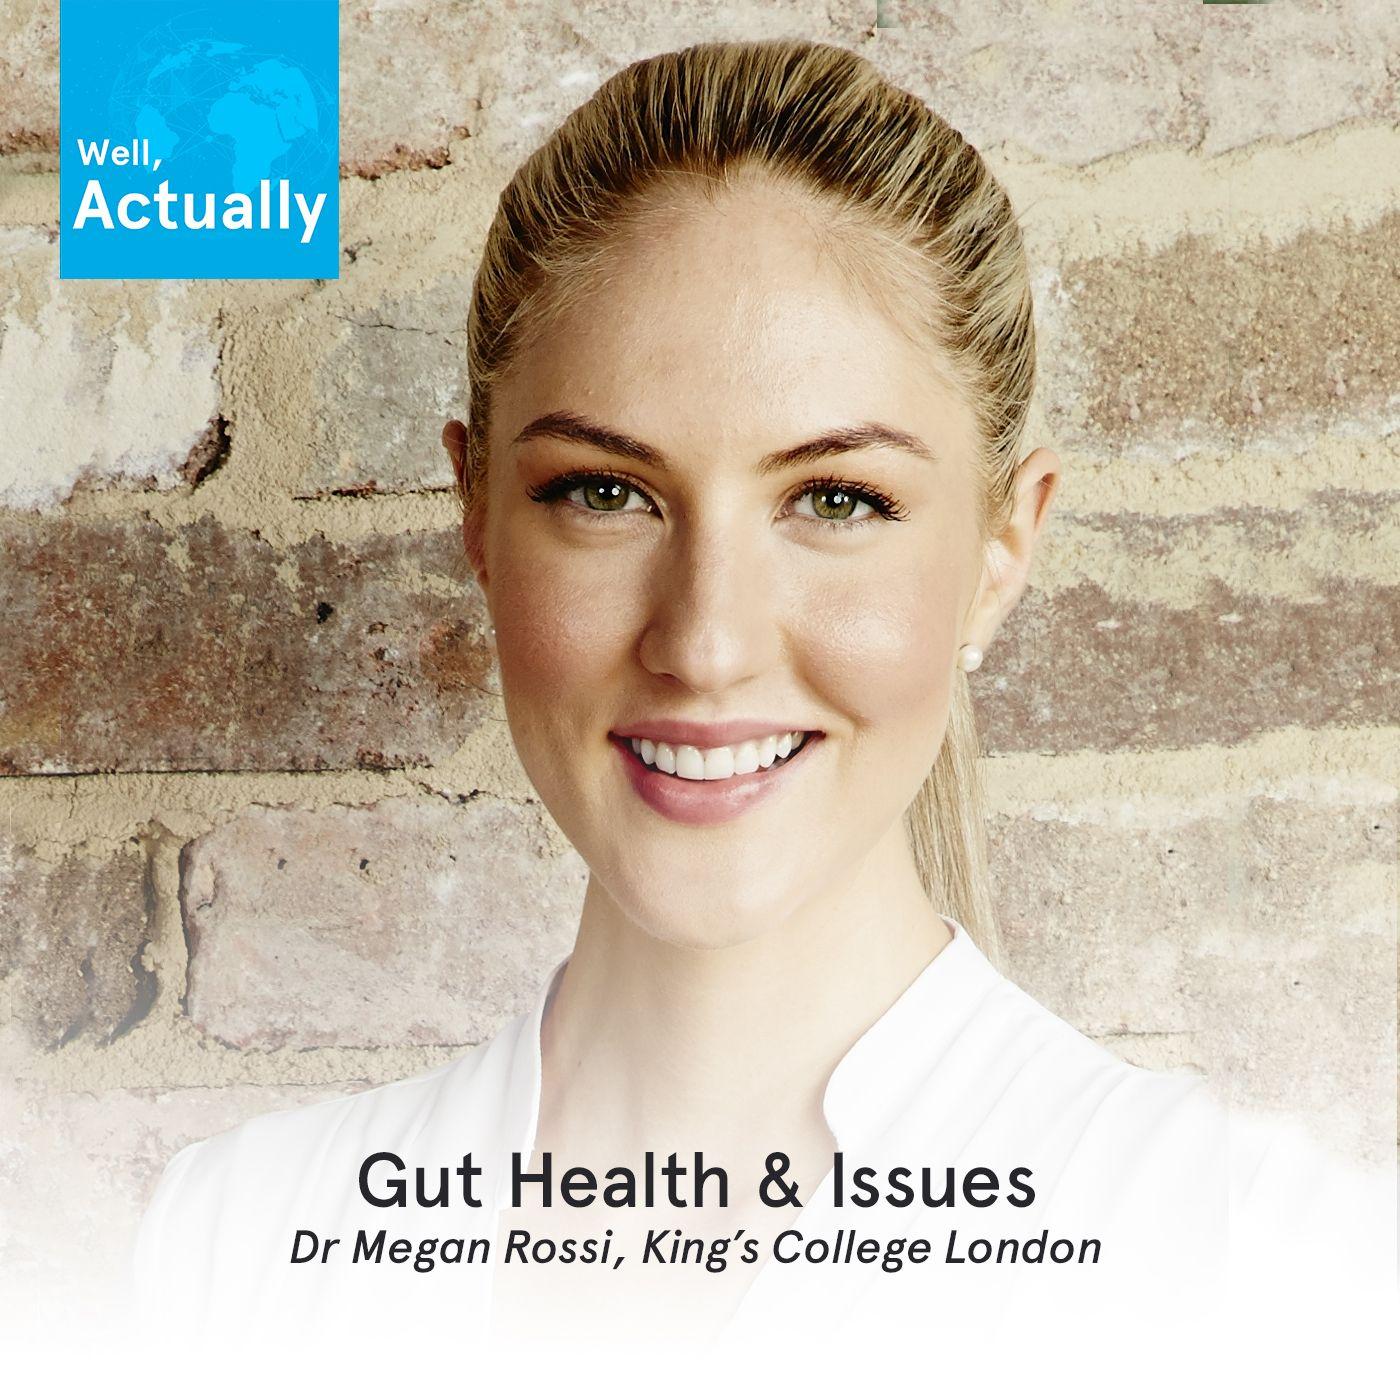 03 - Gut Health & Issues | Dr Megan Rossi